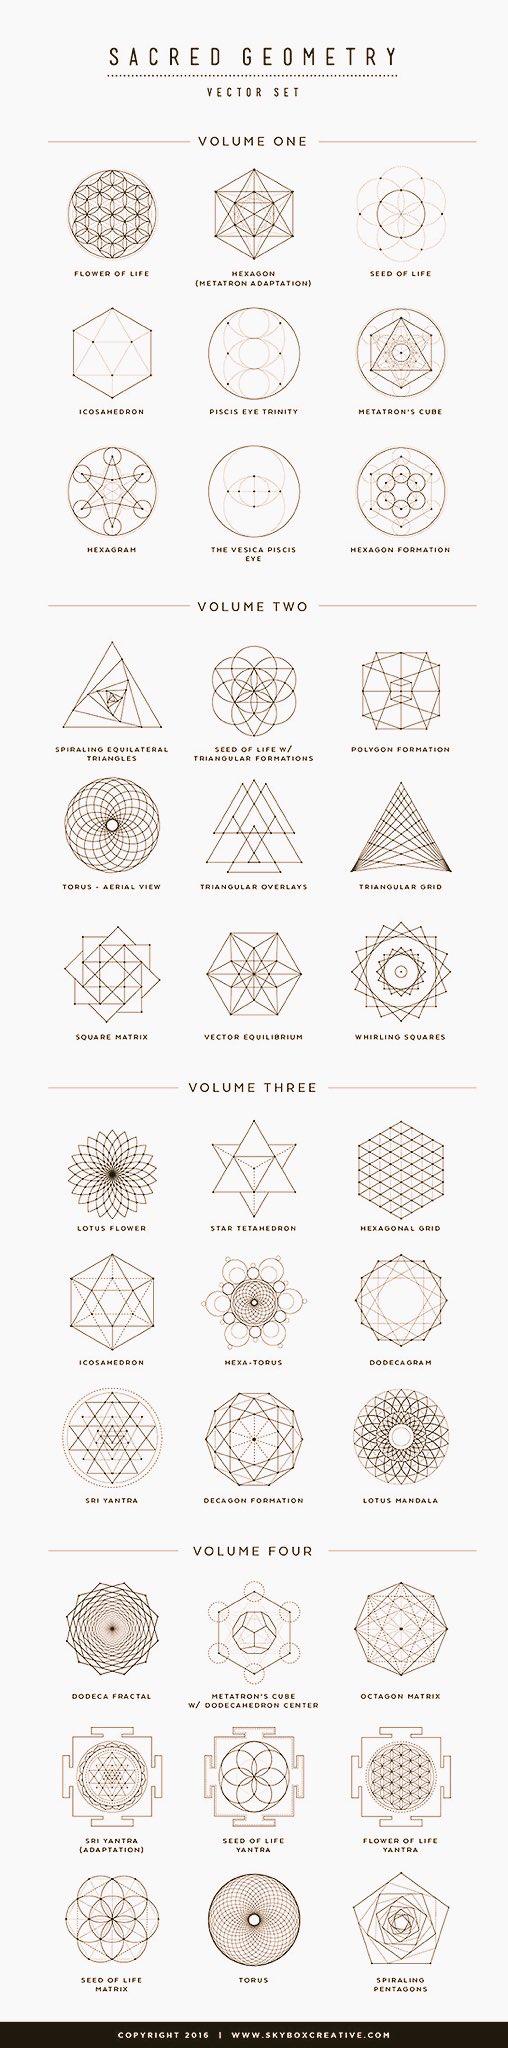 Pin By Classcraft On Sacred Geometry Pinterest Tattoo Symbols